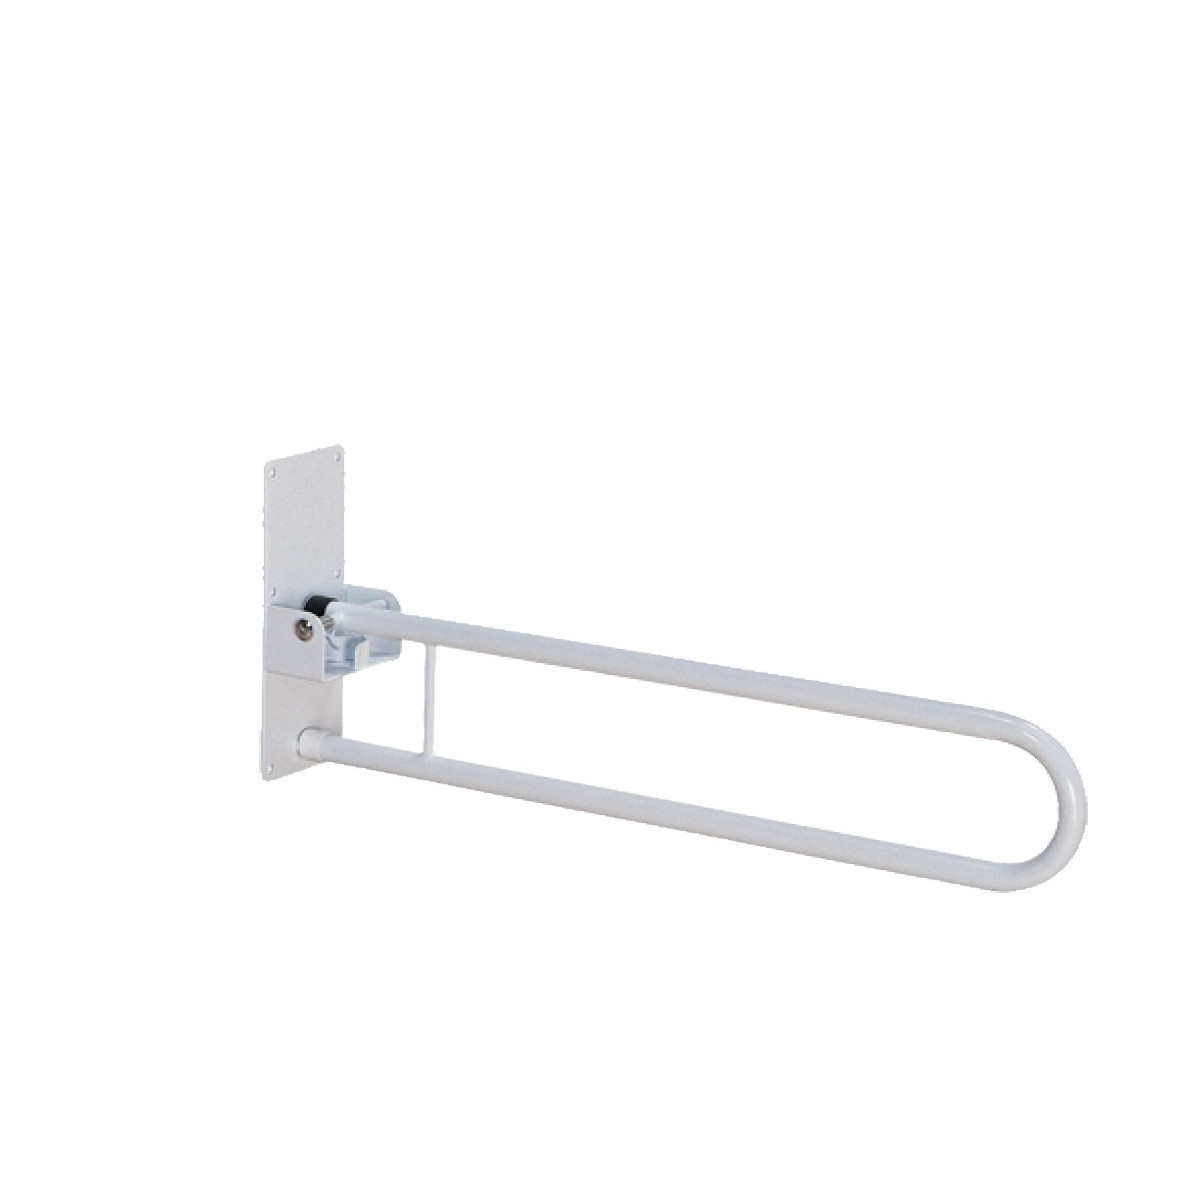 Wall folding handle